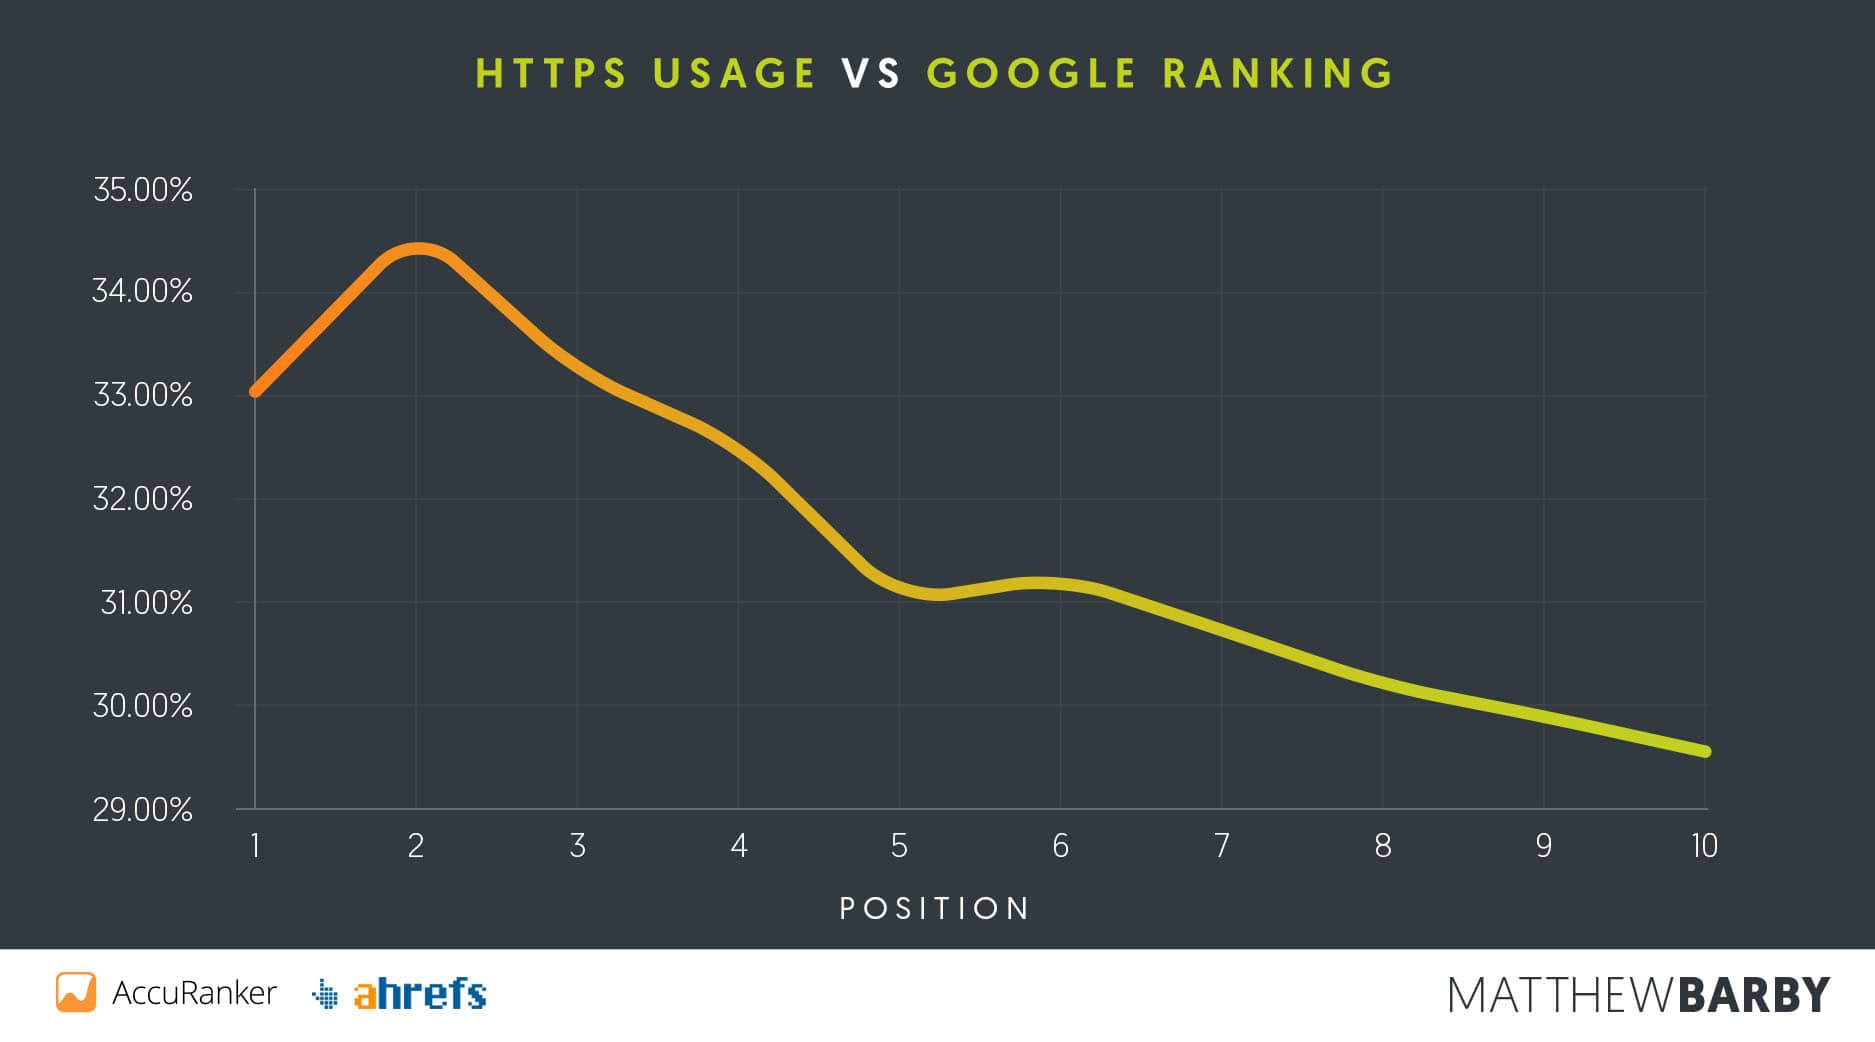 HTTPS-Nutzung vs. Google-Ranking